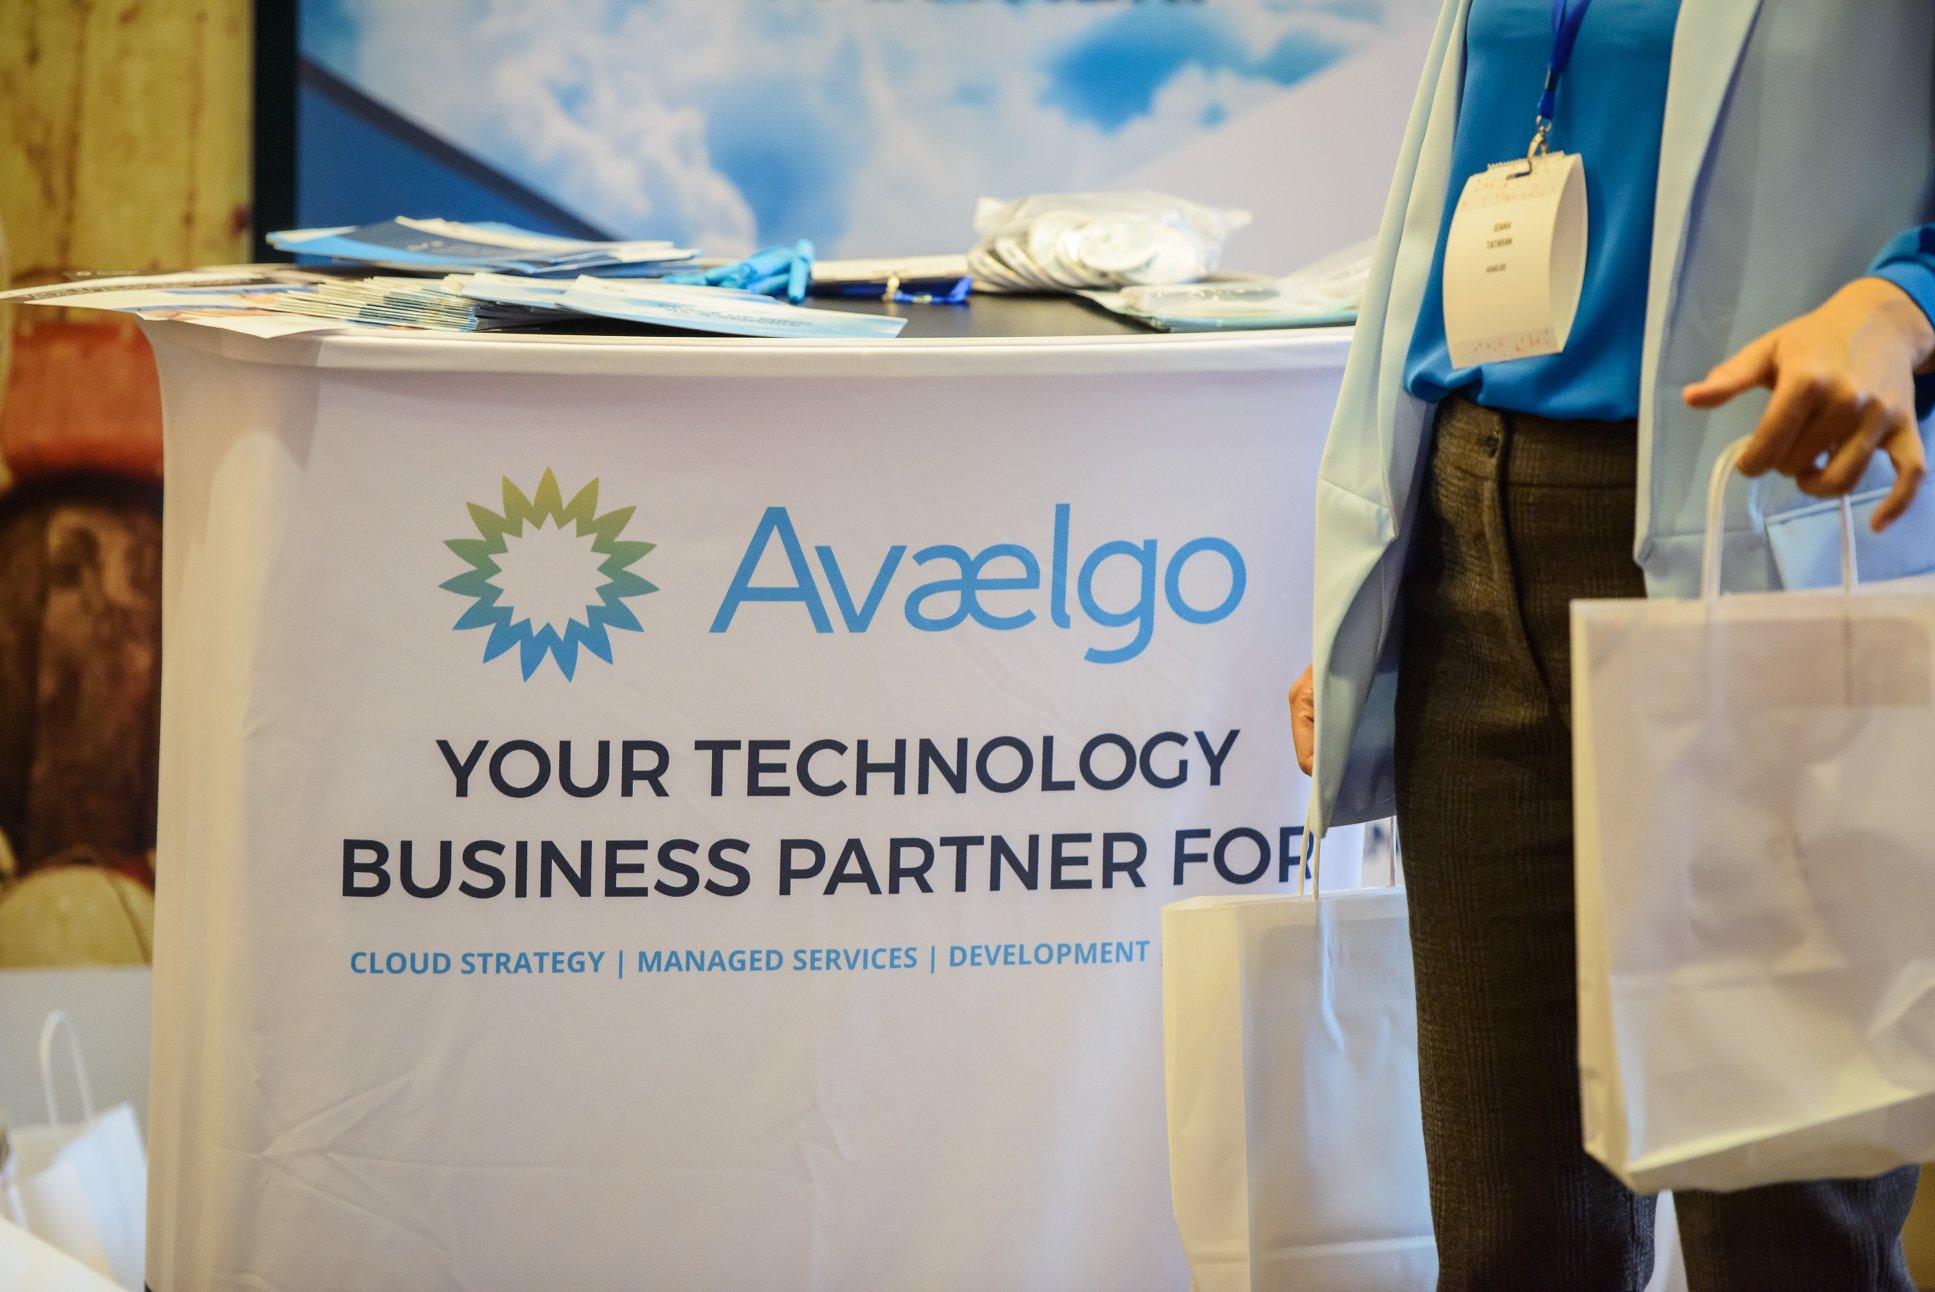 avaelgo cloud conference 2021